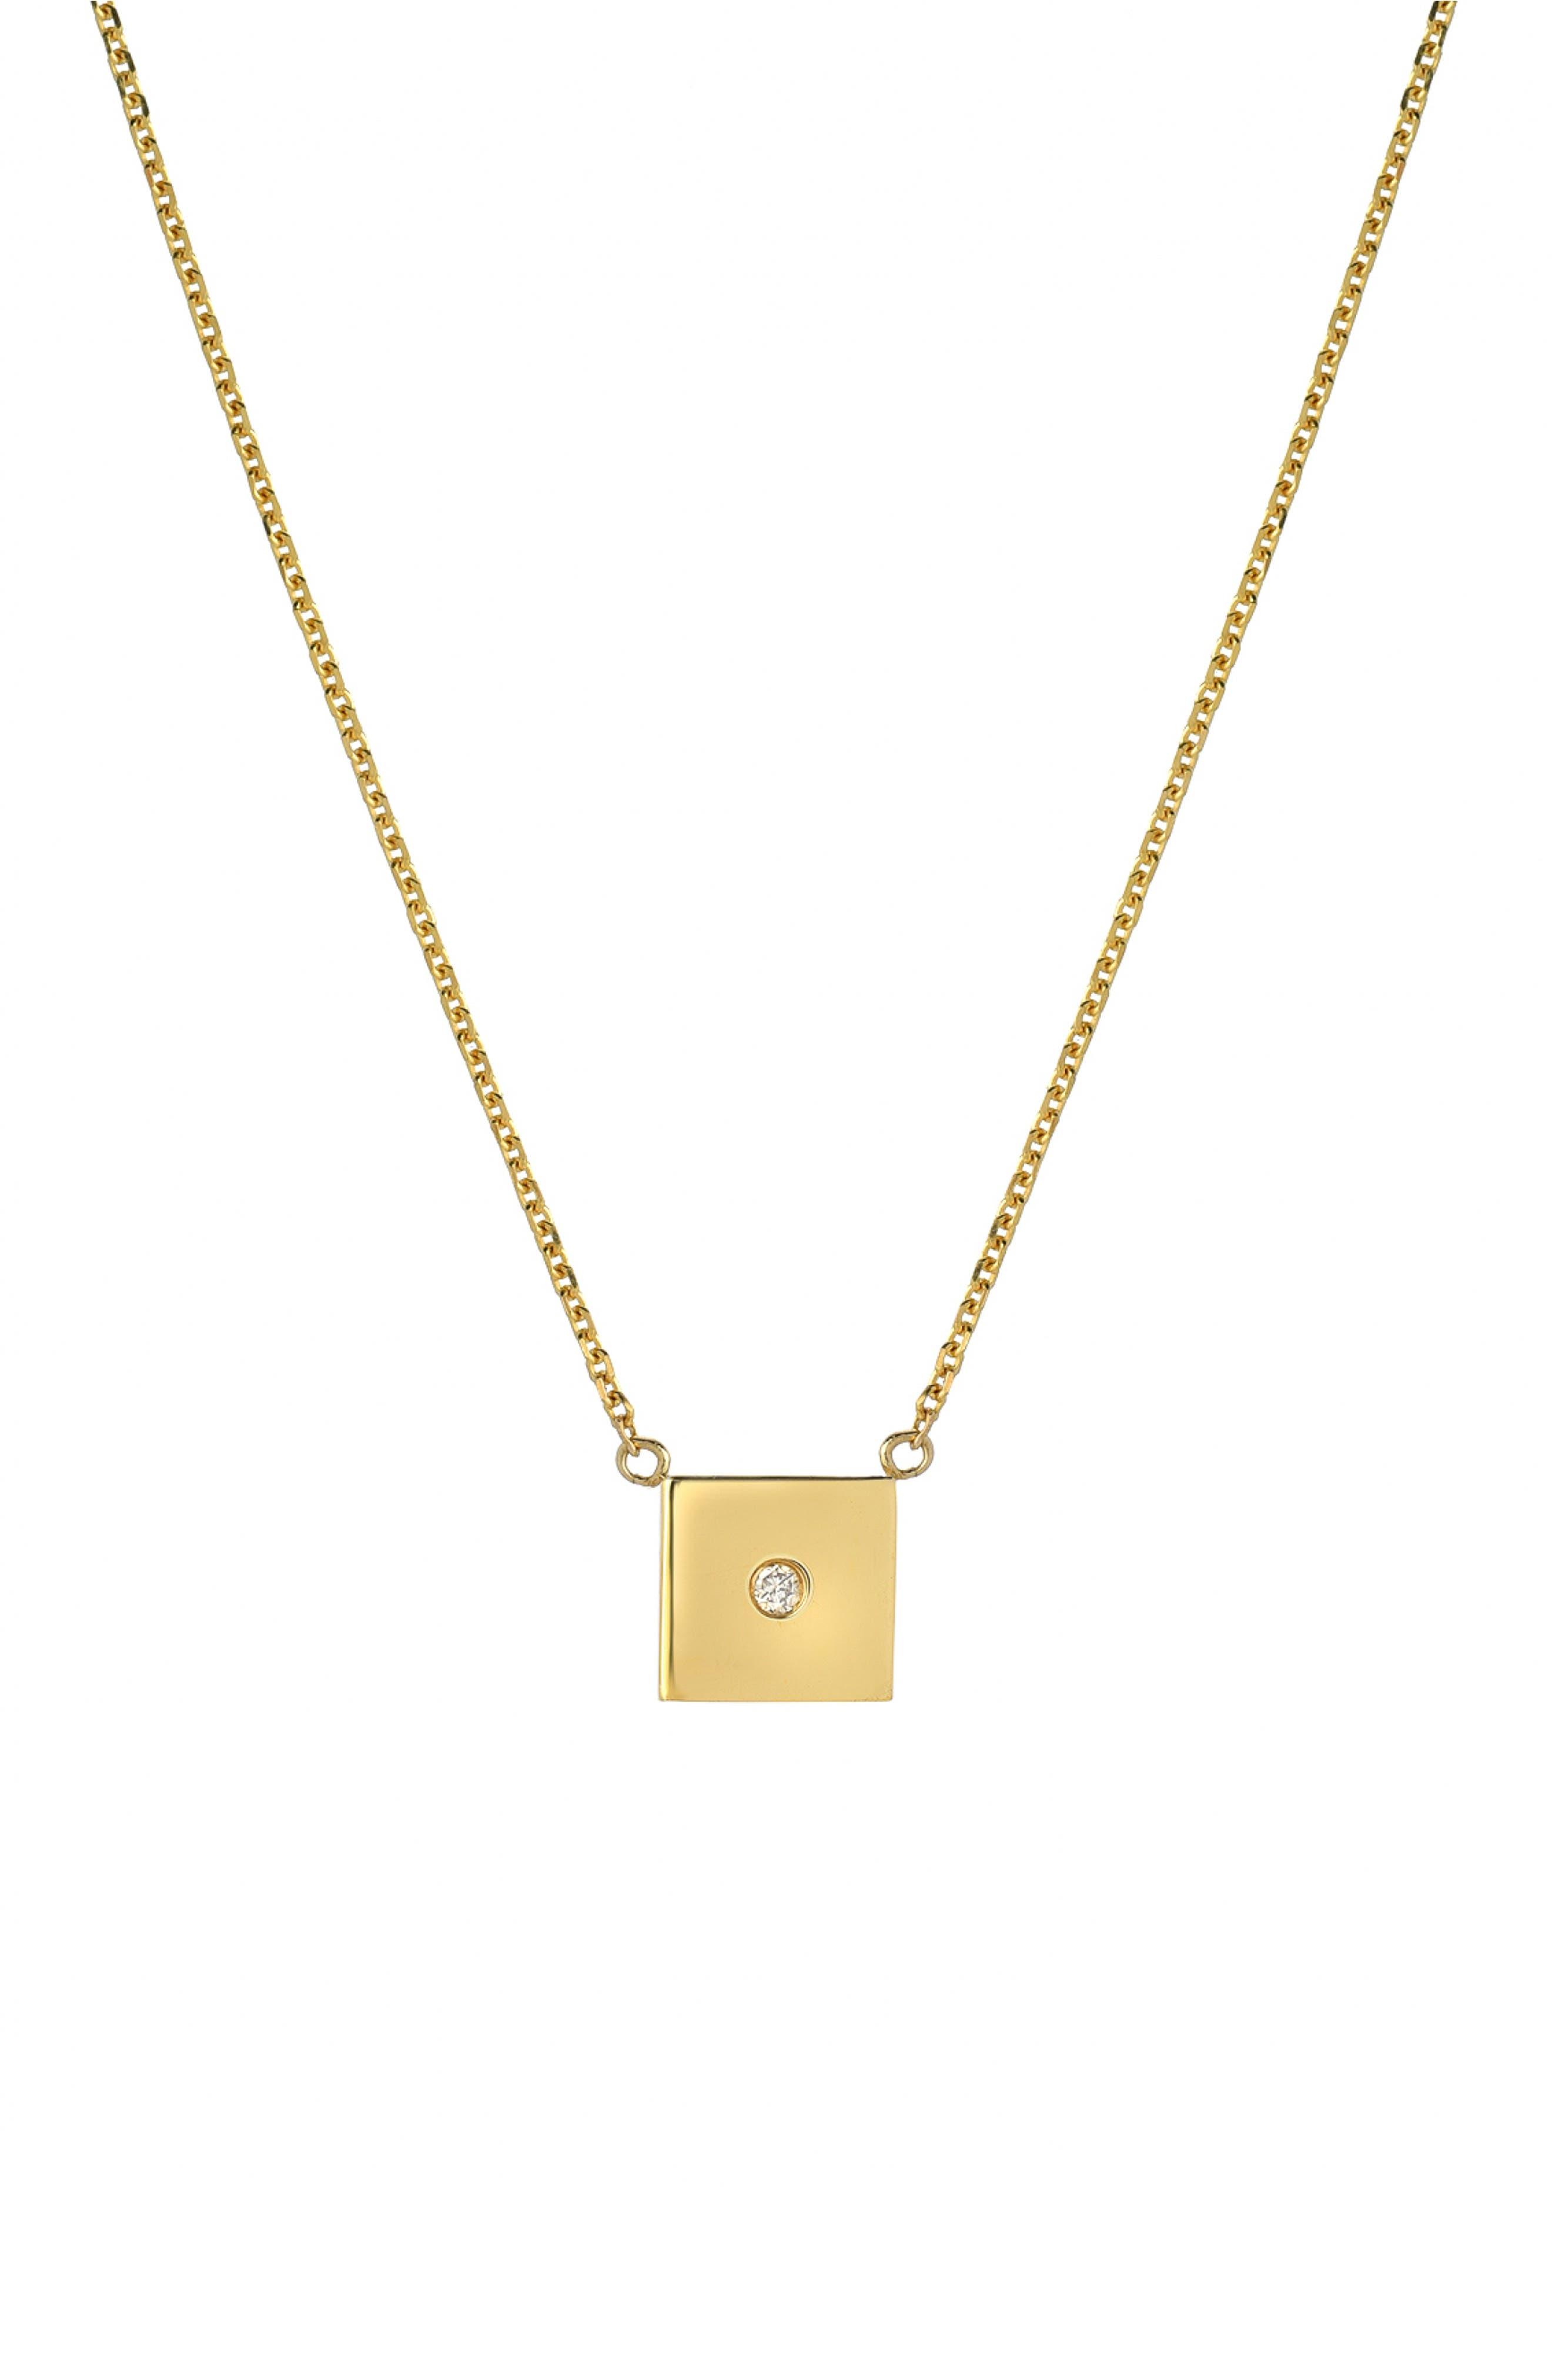 MINI MINI JEWELS Forever Collection - Square Diamond Pendant Necklace, Main, color, YELLOW GOLD